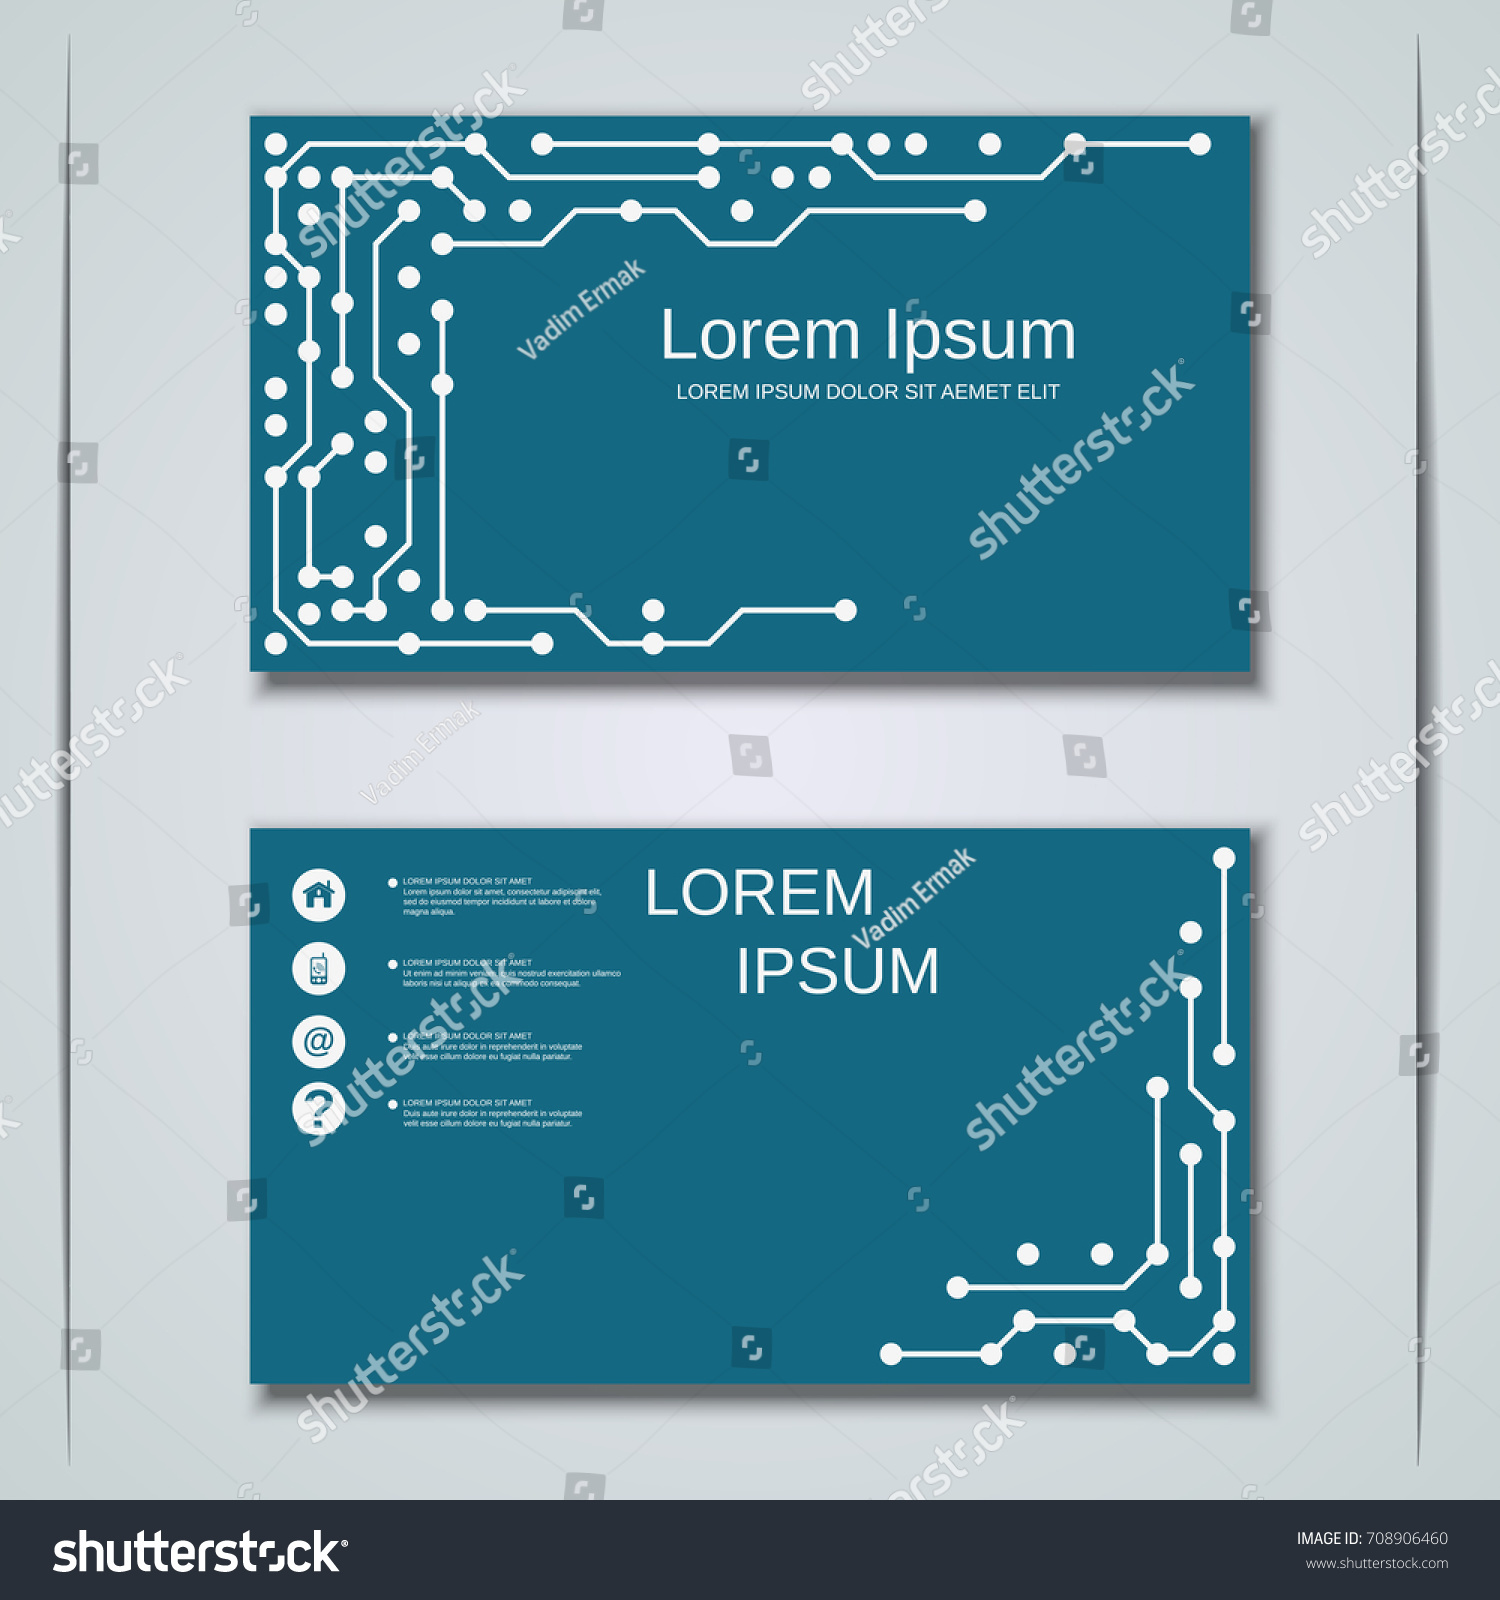 Digital circuit style business visiting card stock vector 708906460 digital circuit style business visiting card vector templates collection colourmoves